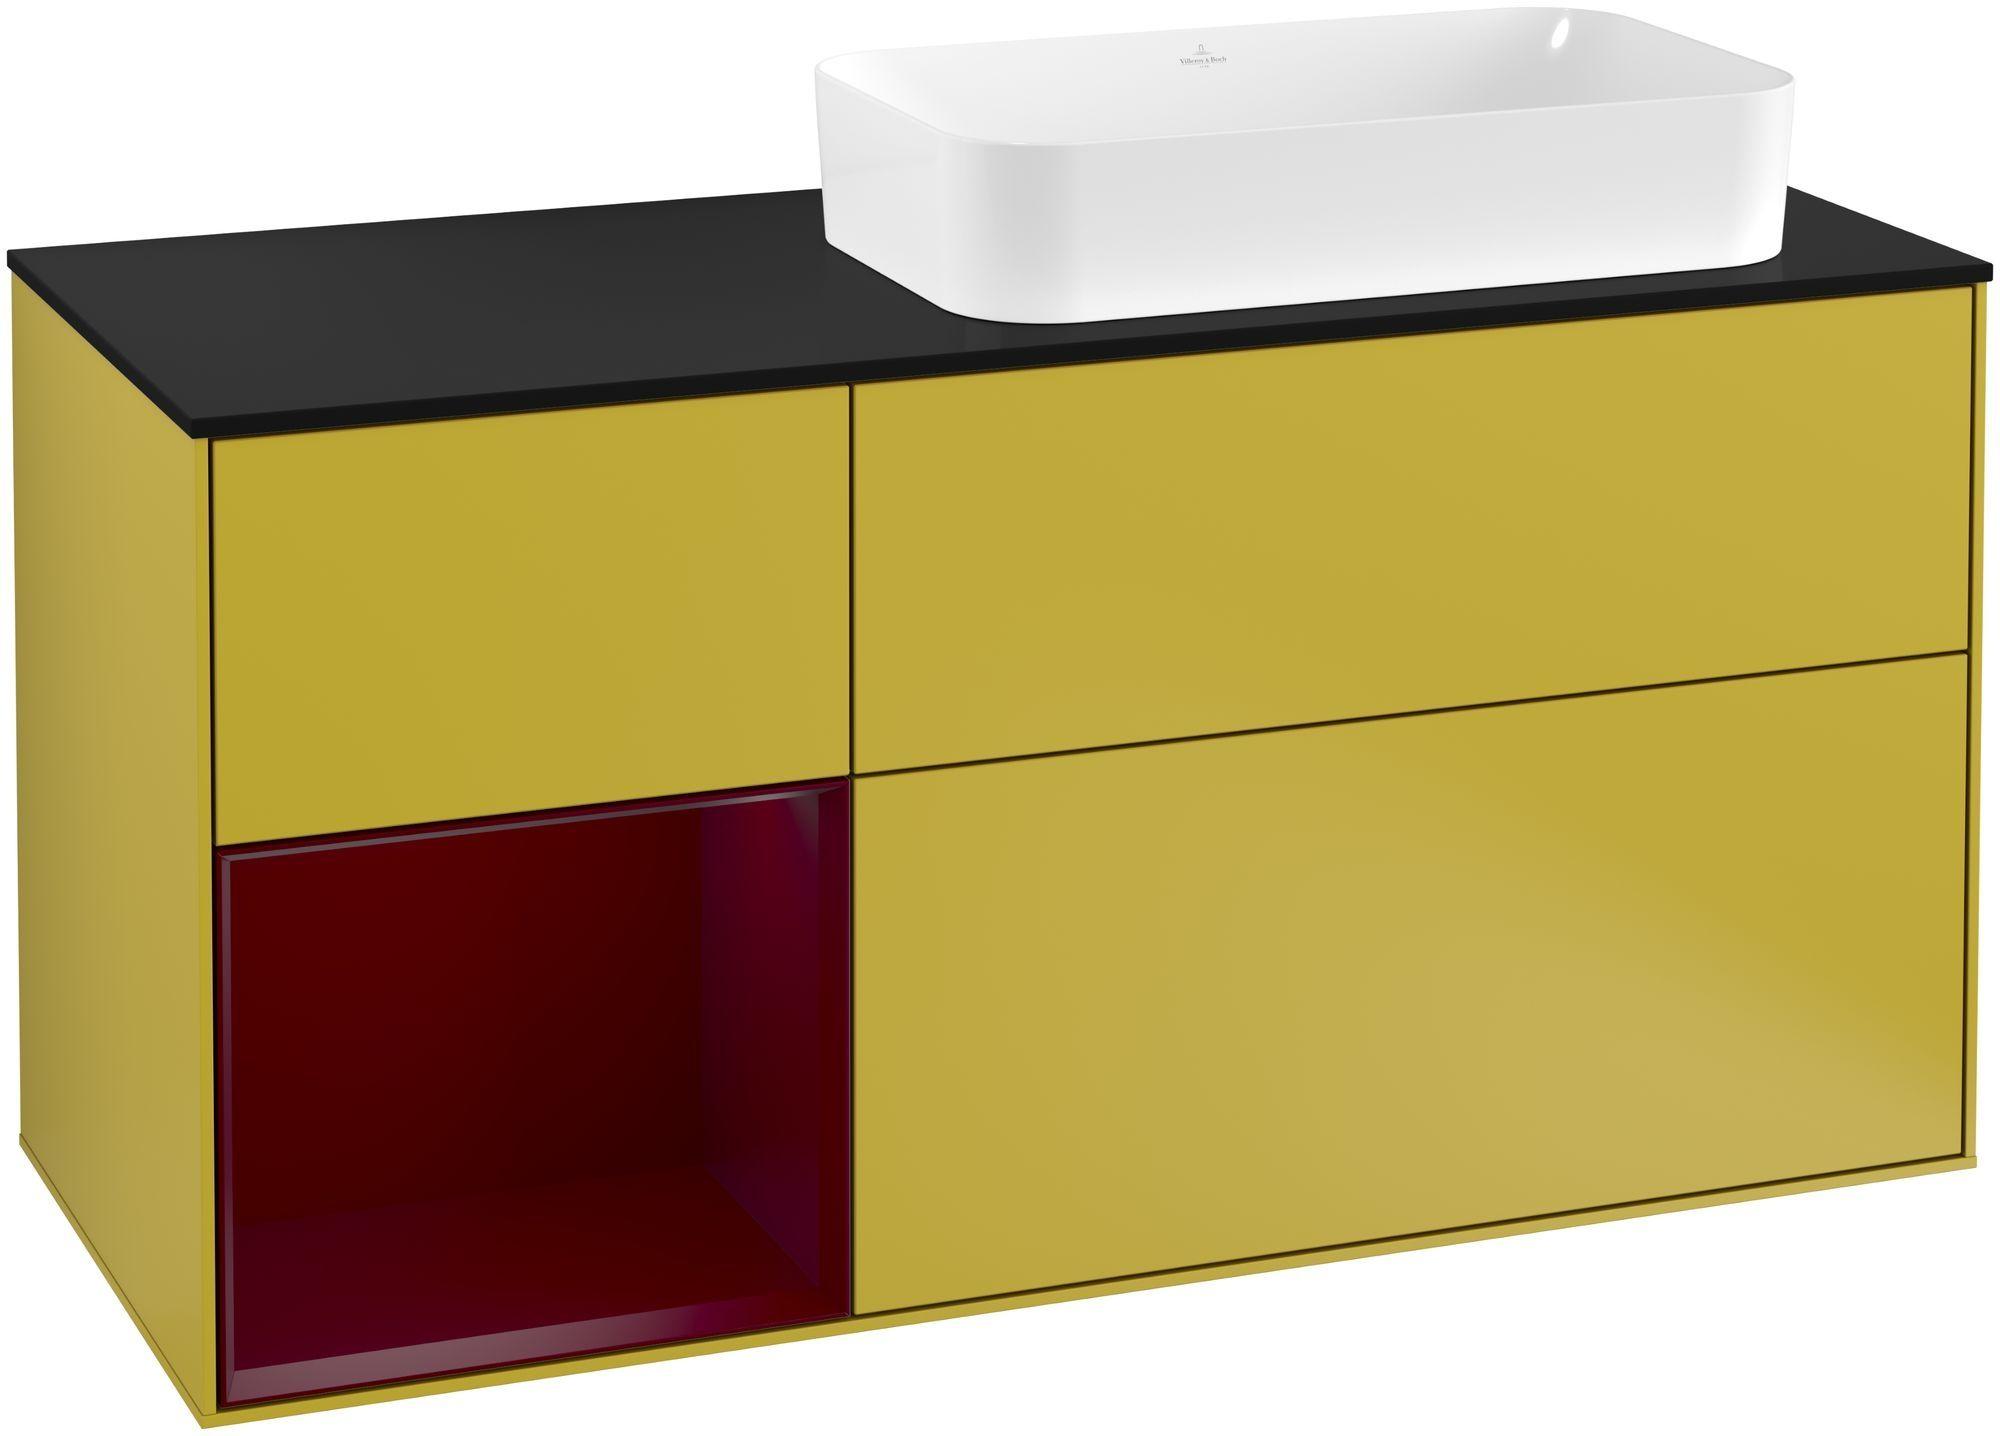 Villeroy & Boch Finion G27 Waschtischunterschrank mit Regalelement 3 Auszüge Waschtisch rechts LED-Beleuchtung B:120xH:60,3xT:50,1cm Front, Korpus: Sun, Regal: Peony, Glasplatte: Black Matt G272HBHE